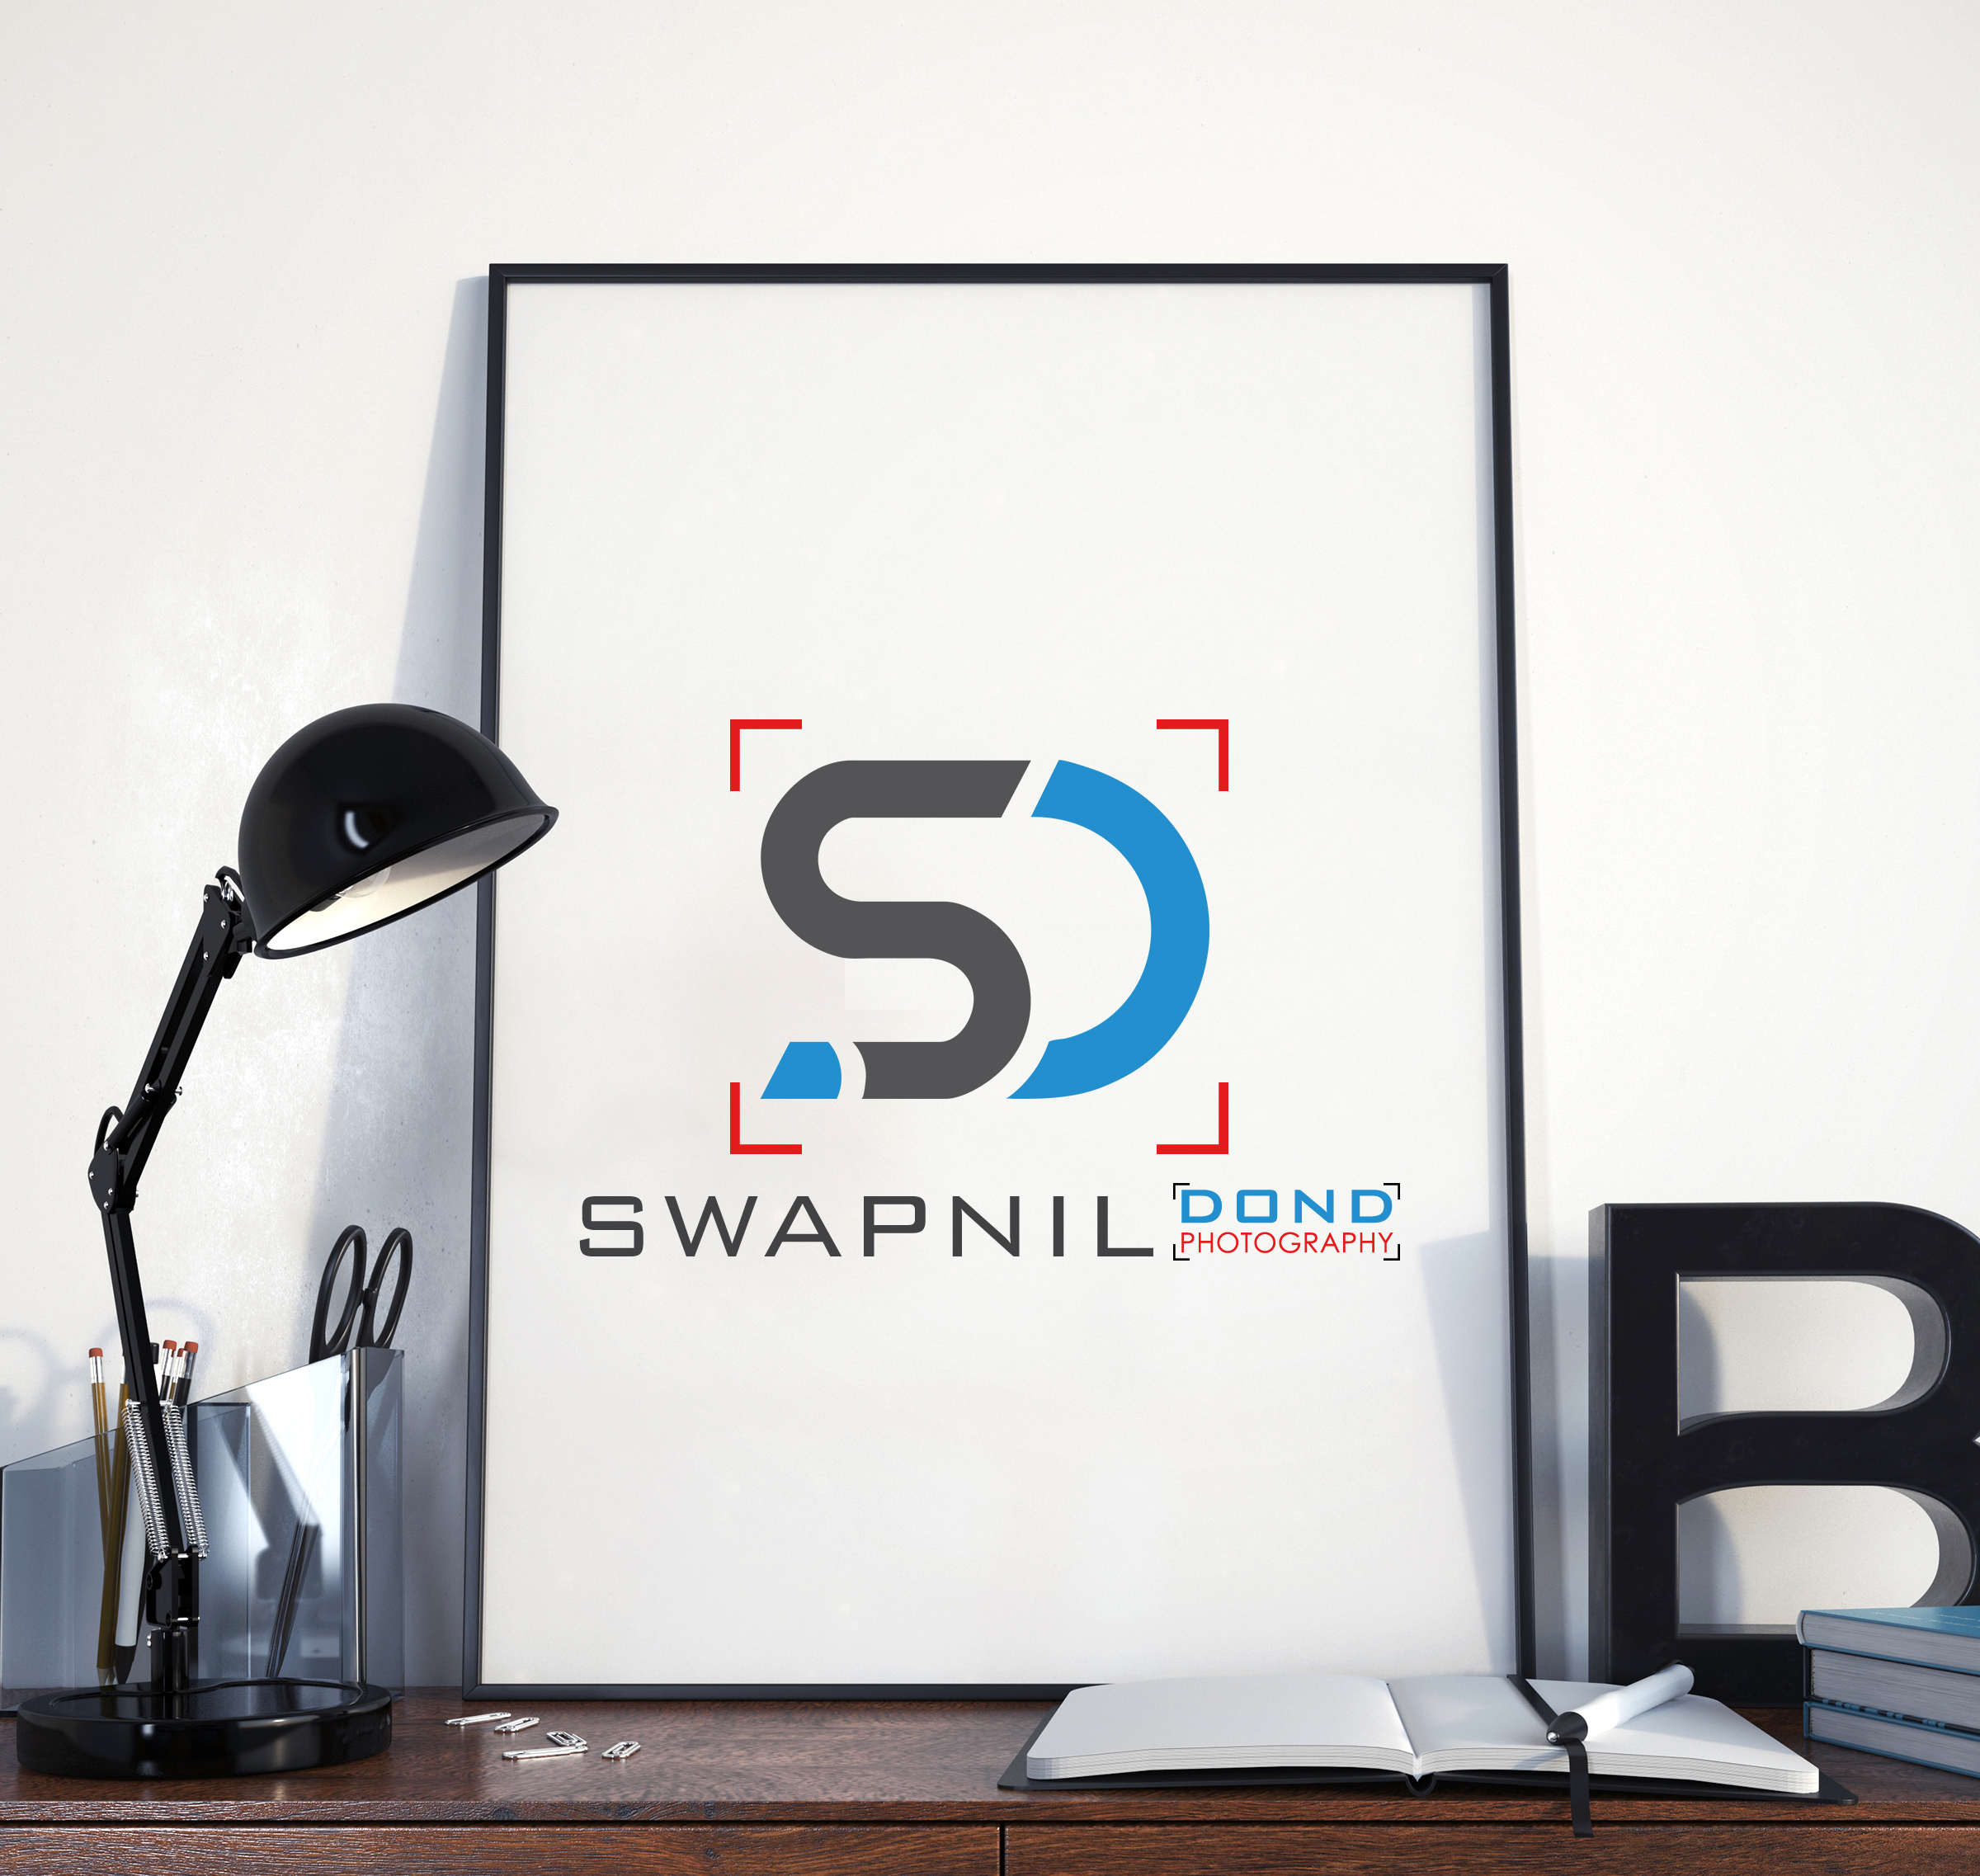 Swapnil dond photography logo design by Badri Design